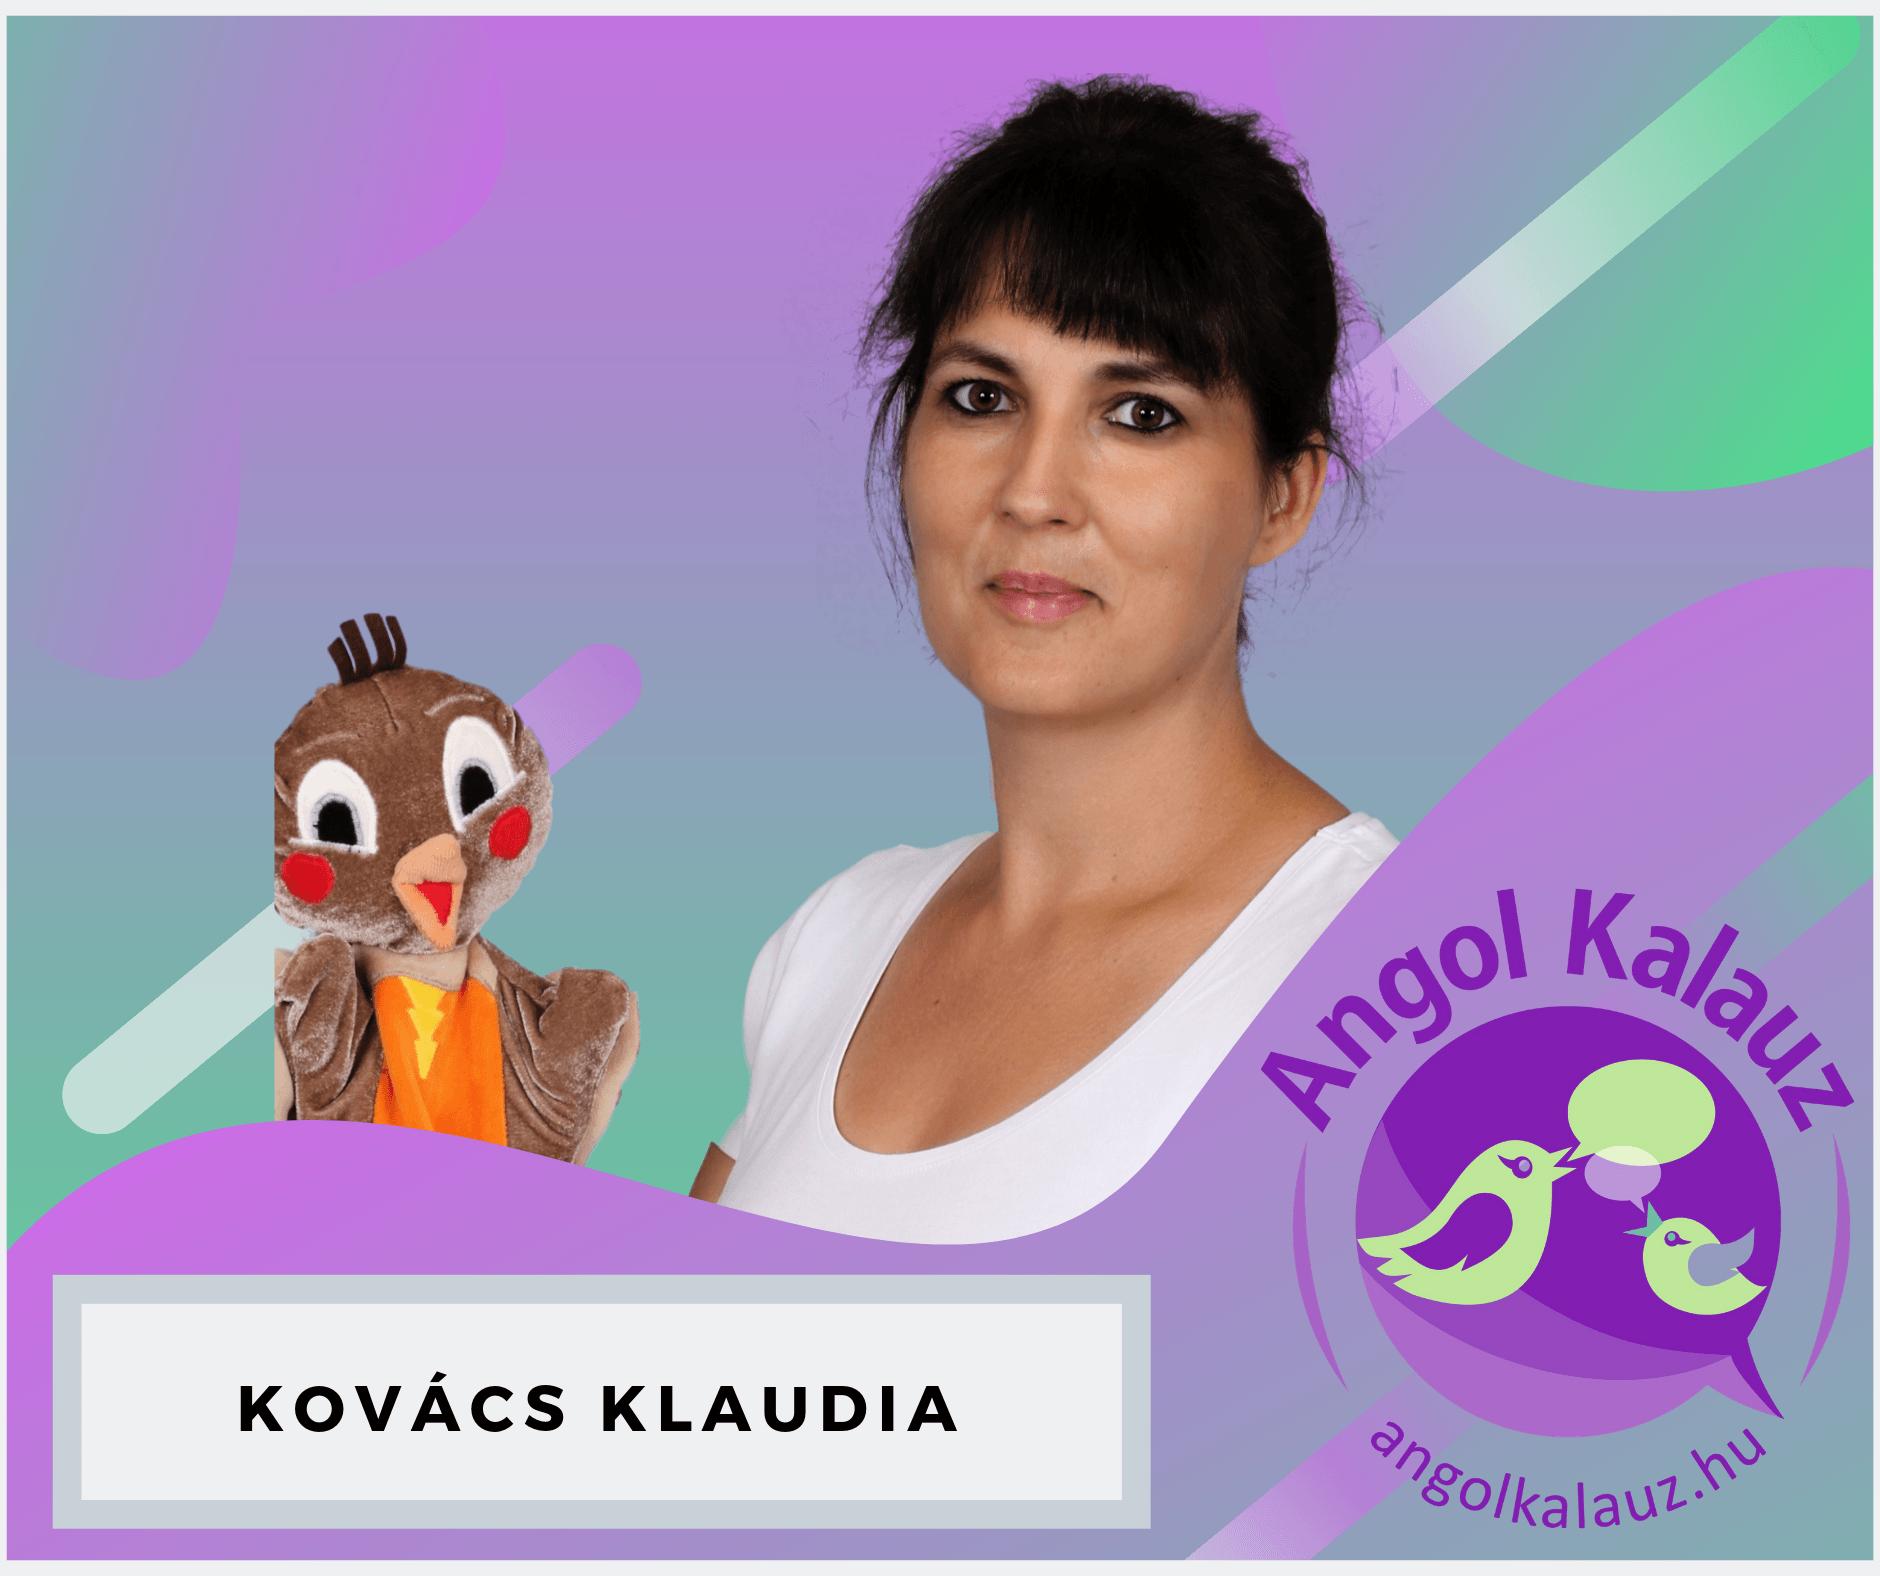 Kovács Klaudia